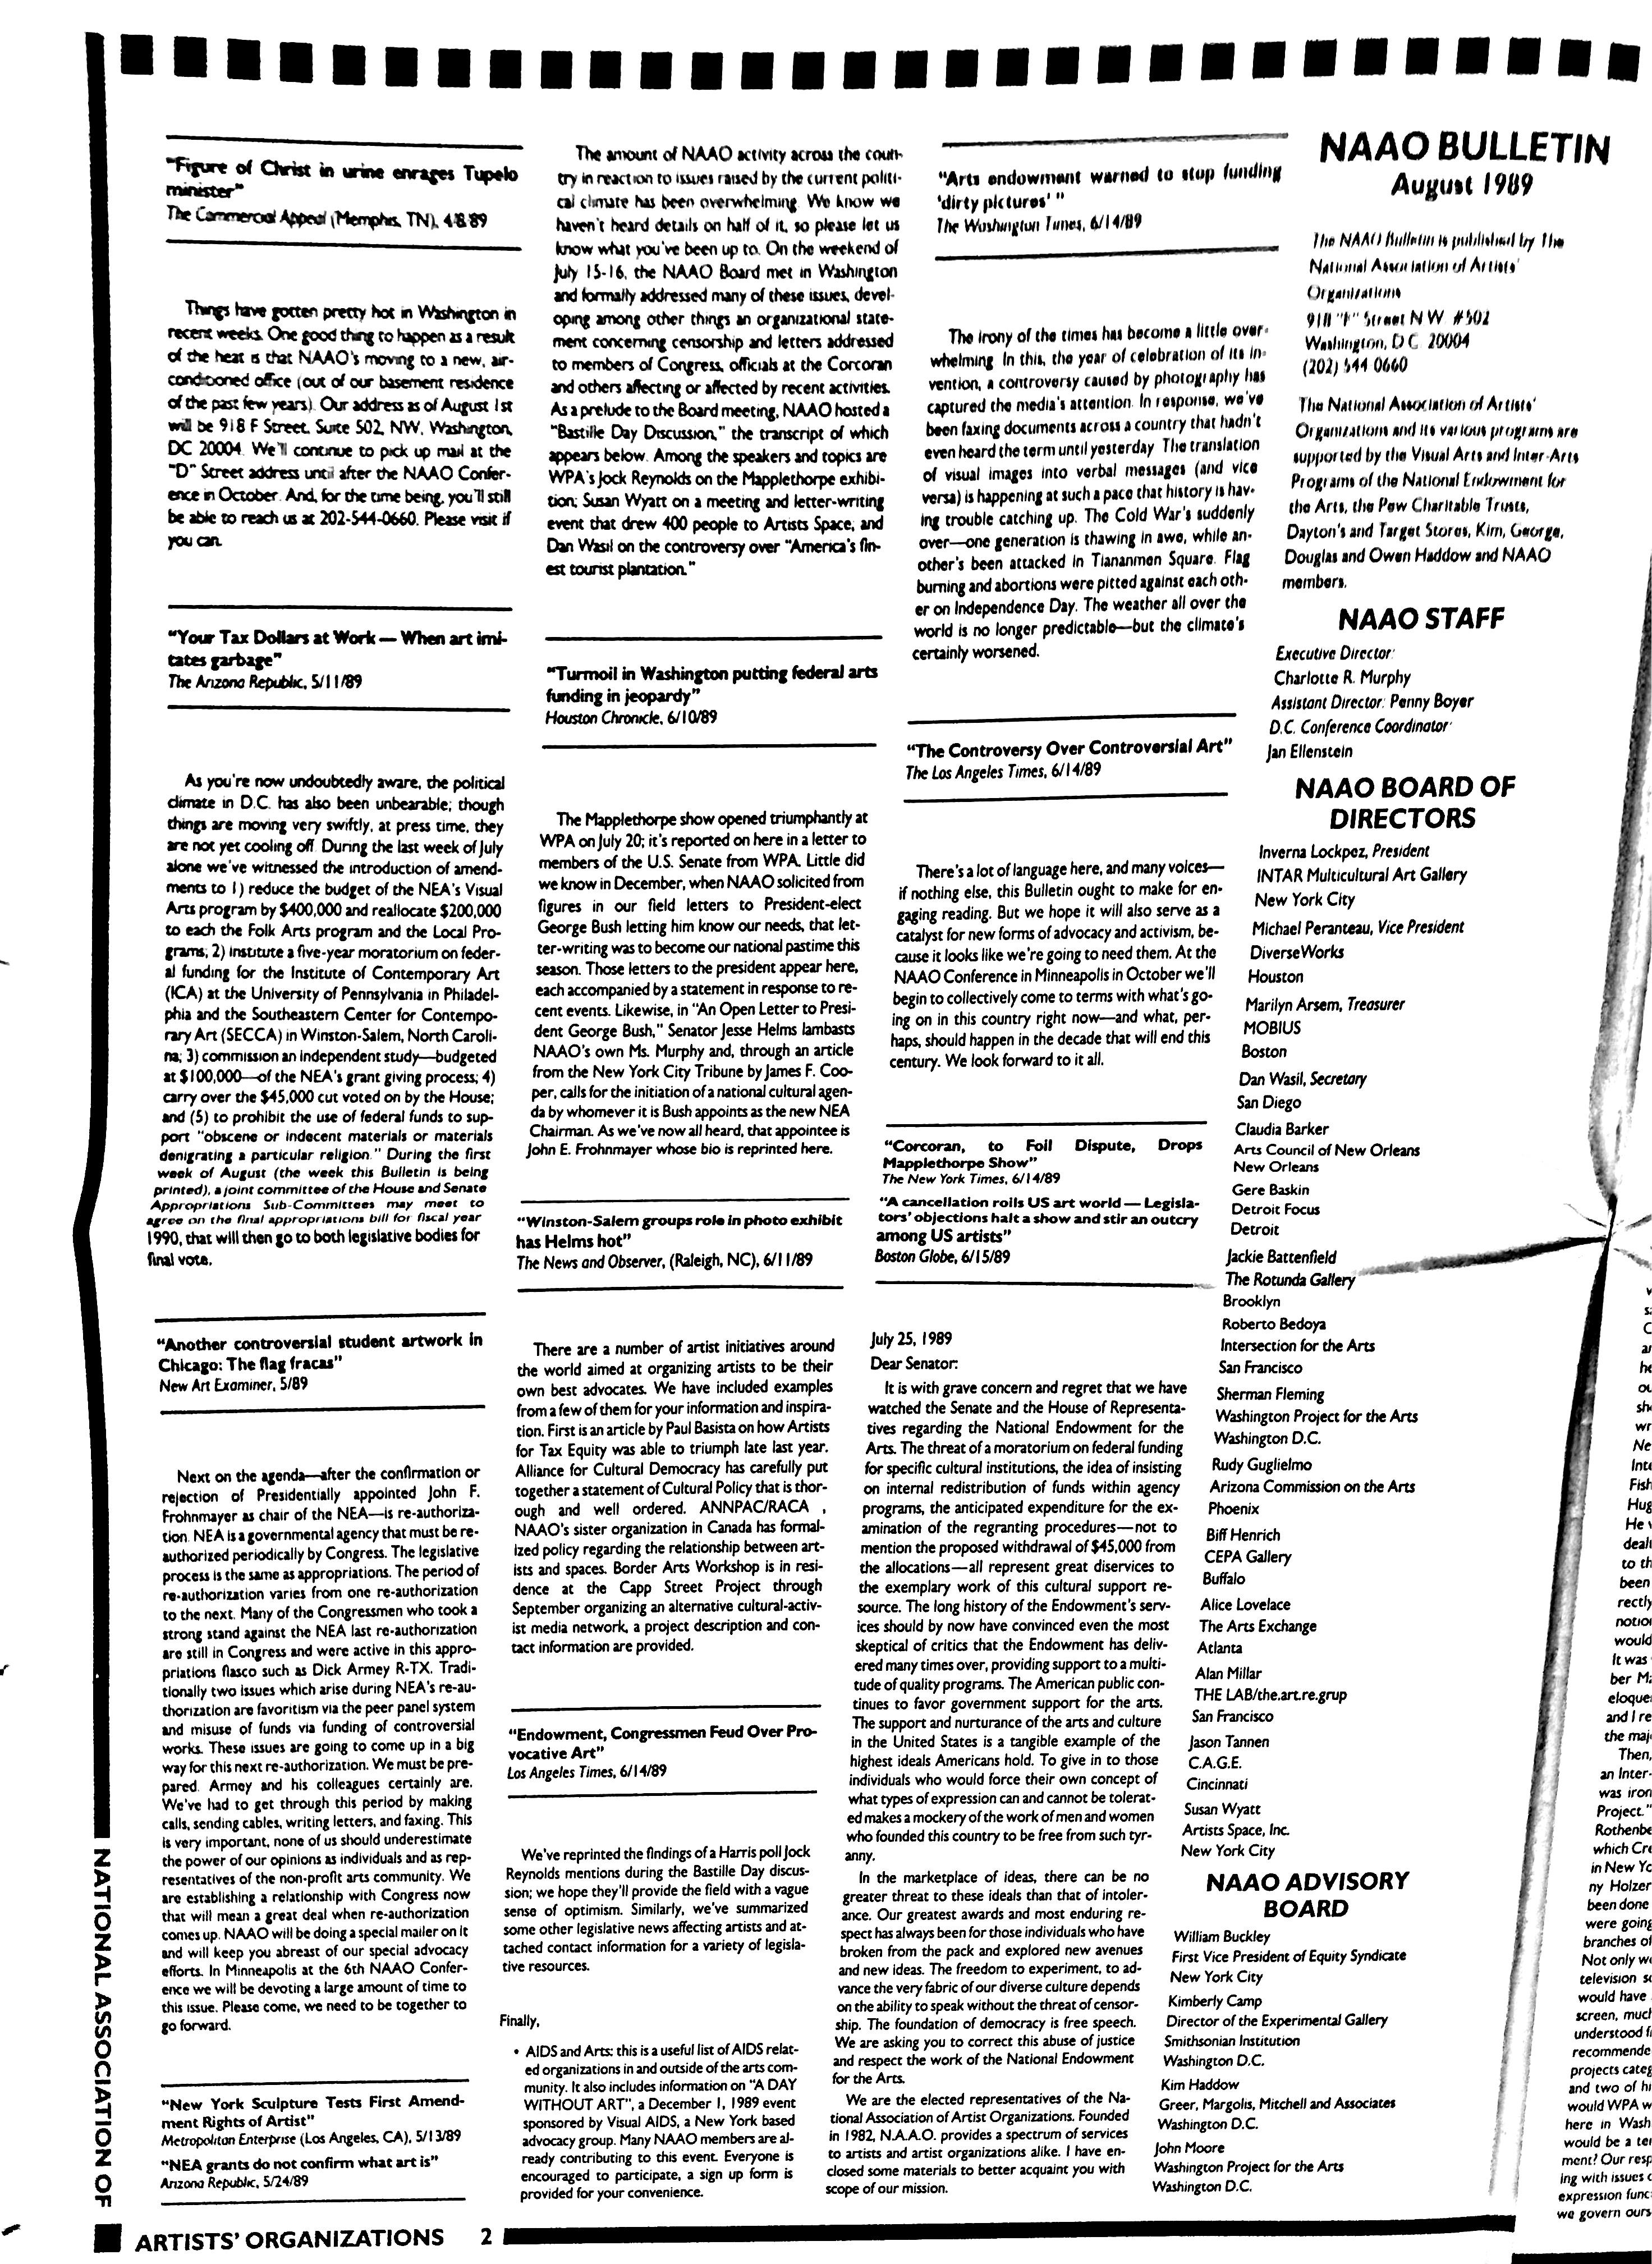 August 1989 - NAAO Bulletin Page 3.jpg